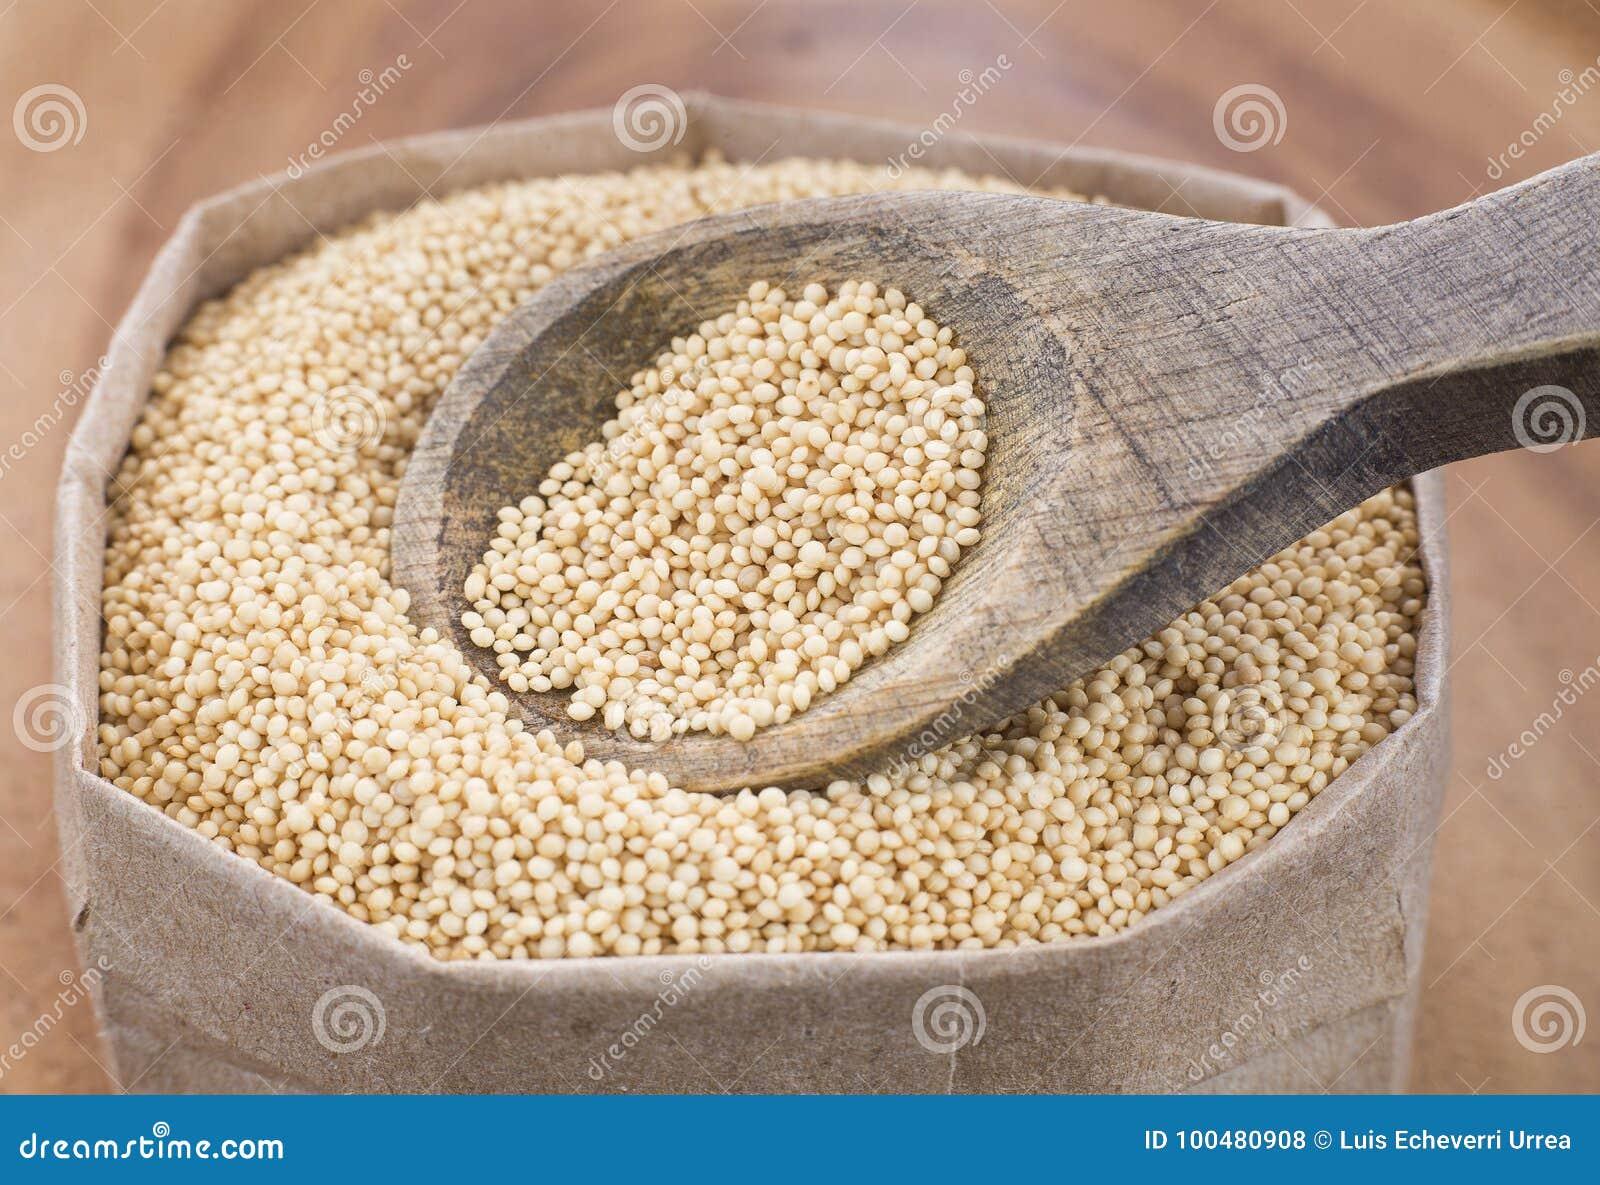 Amaranth seeds - Amaranthus